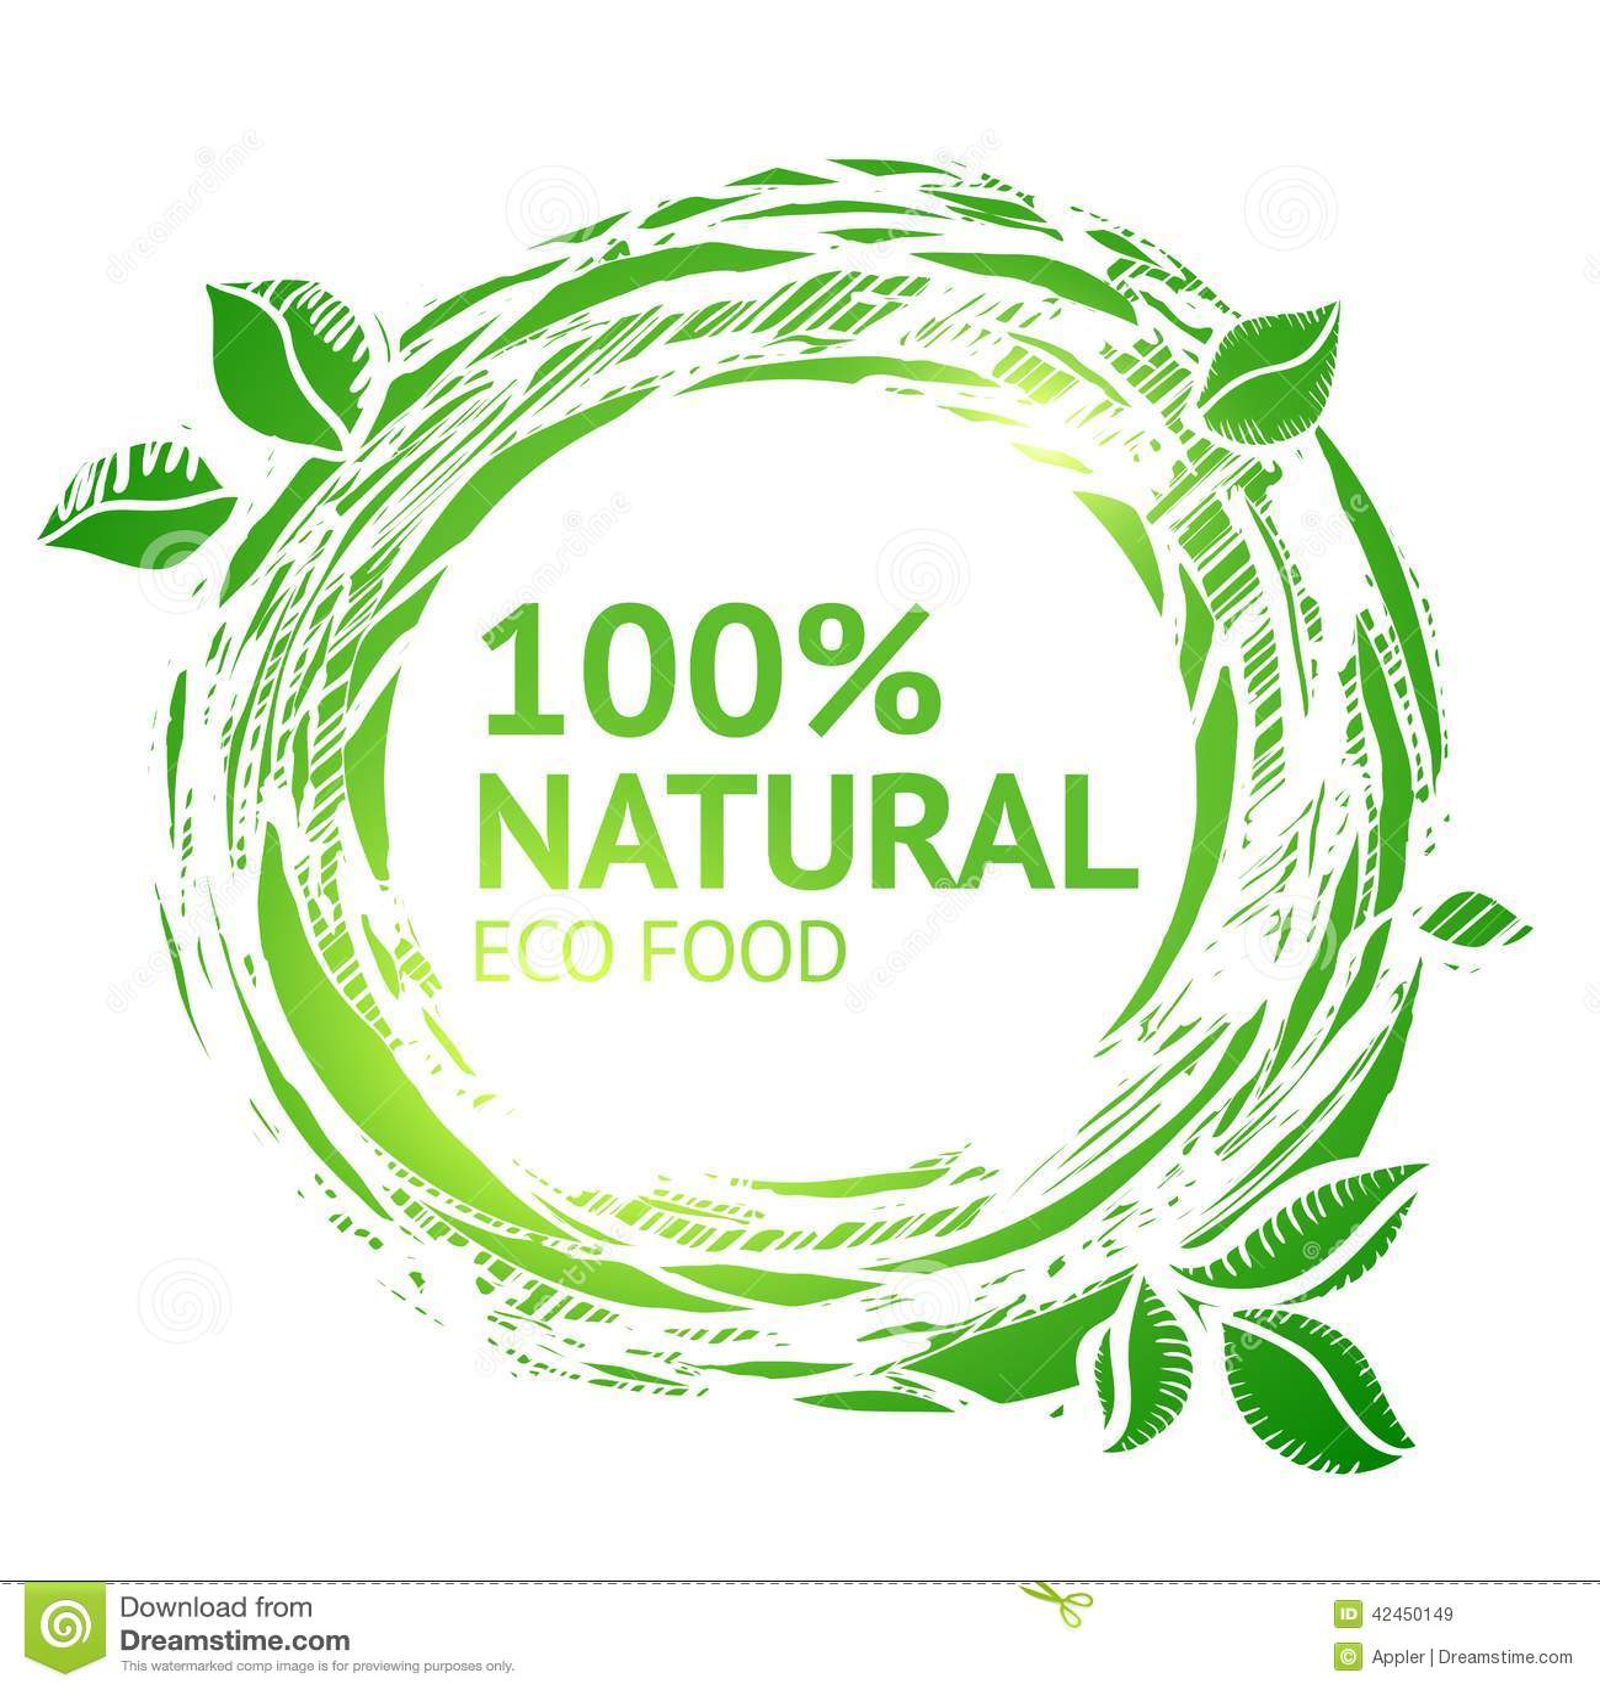 Eco food grunge label stock vector image 42450149 for Eco cuisine design avis